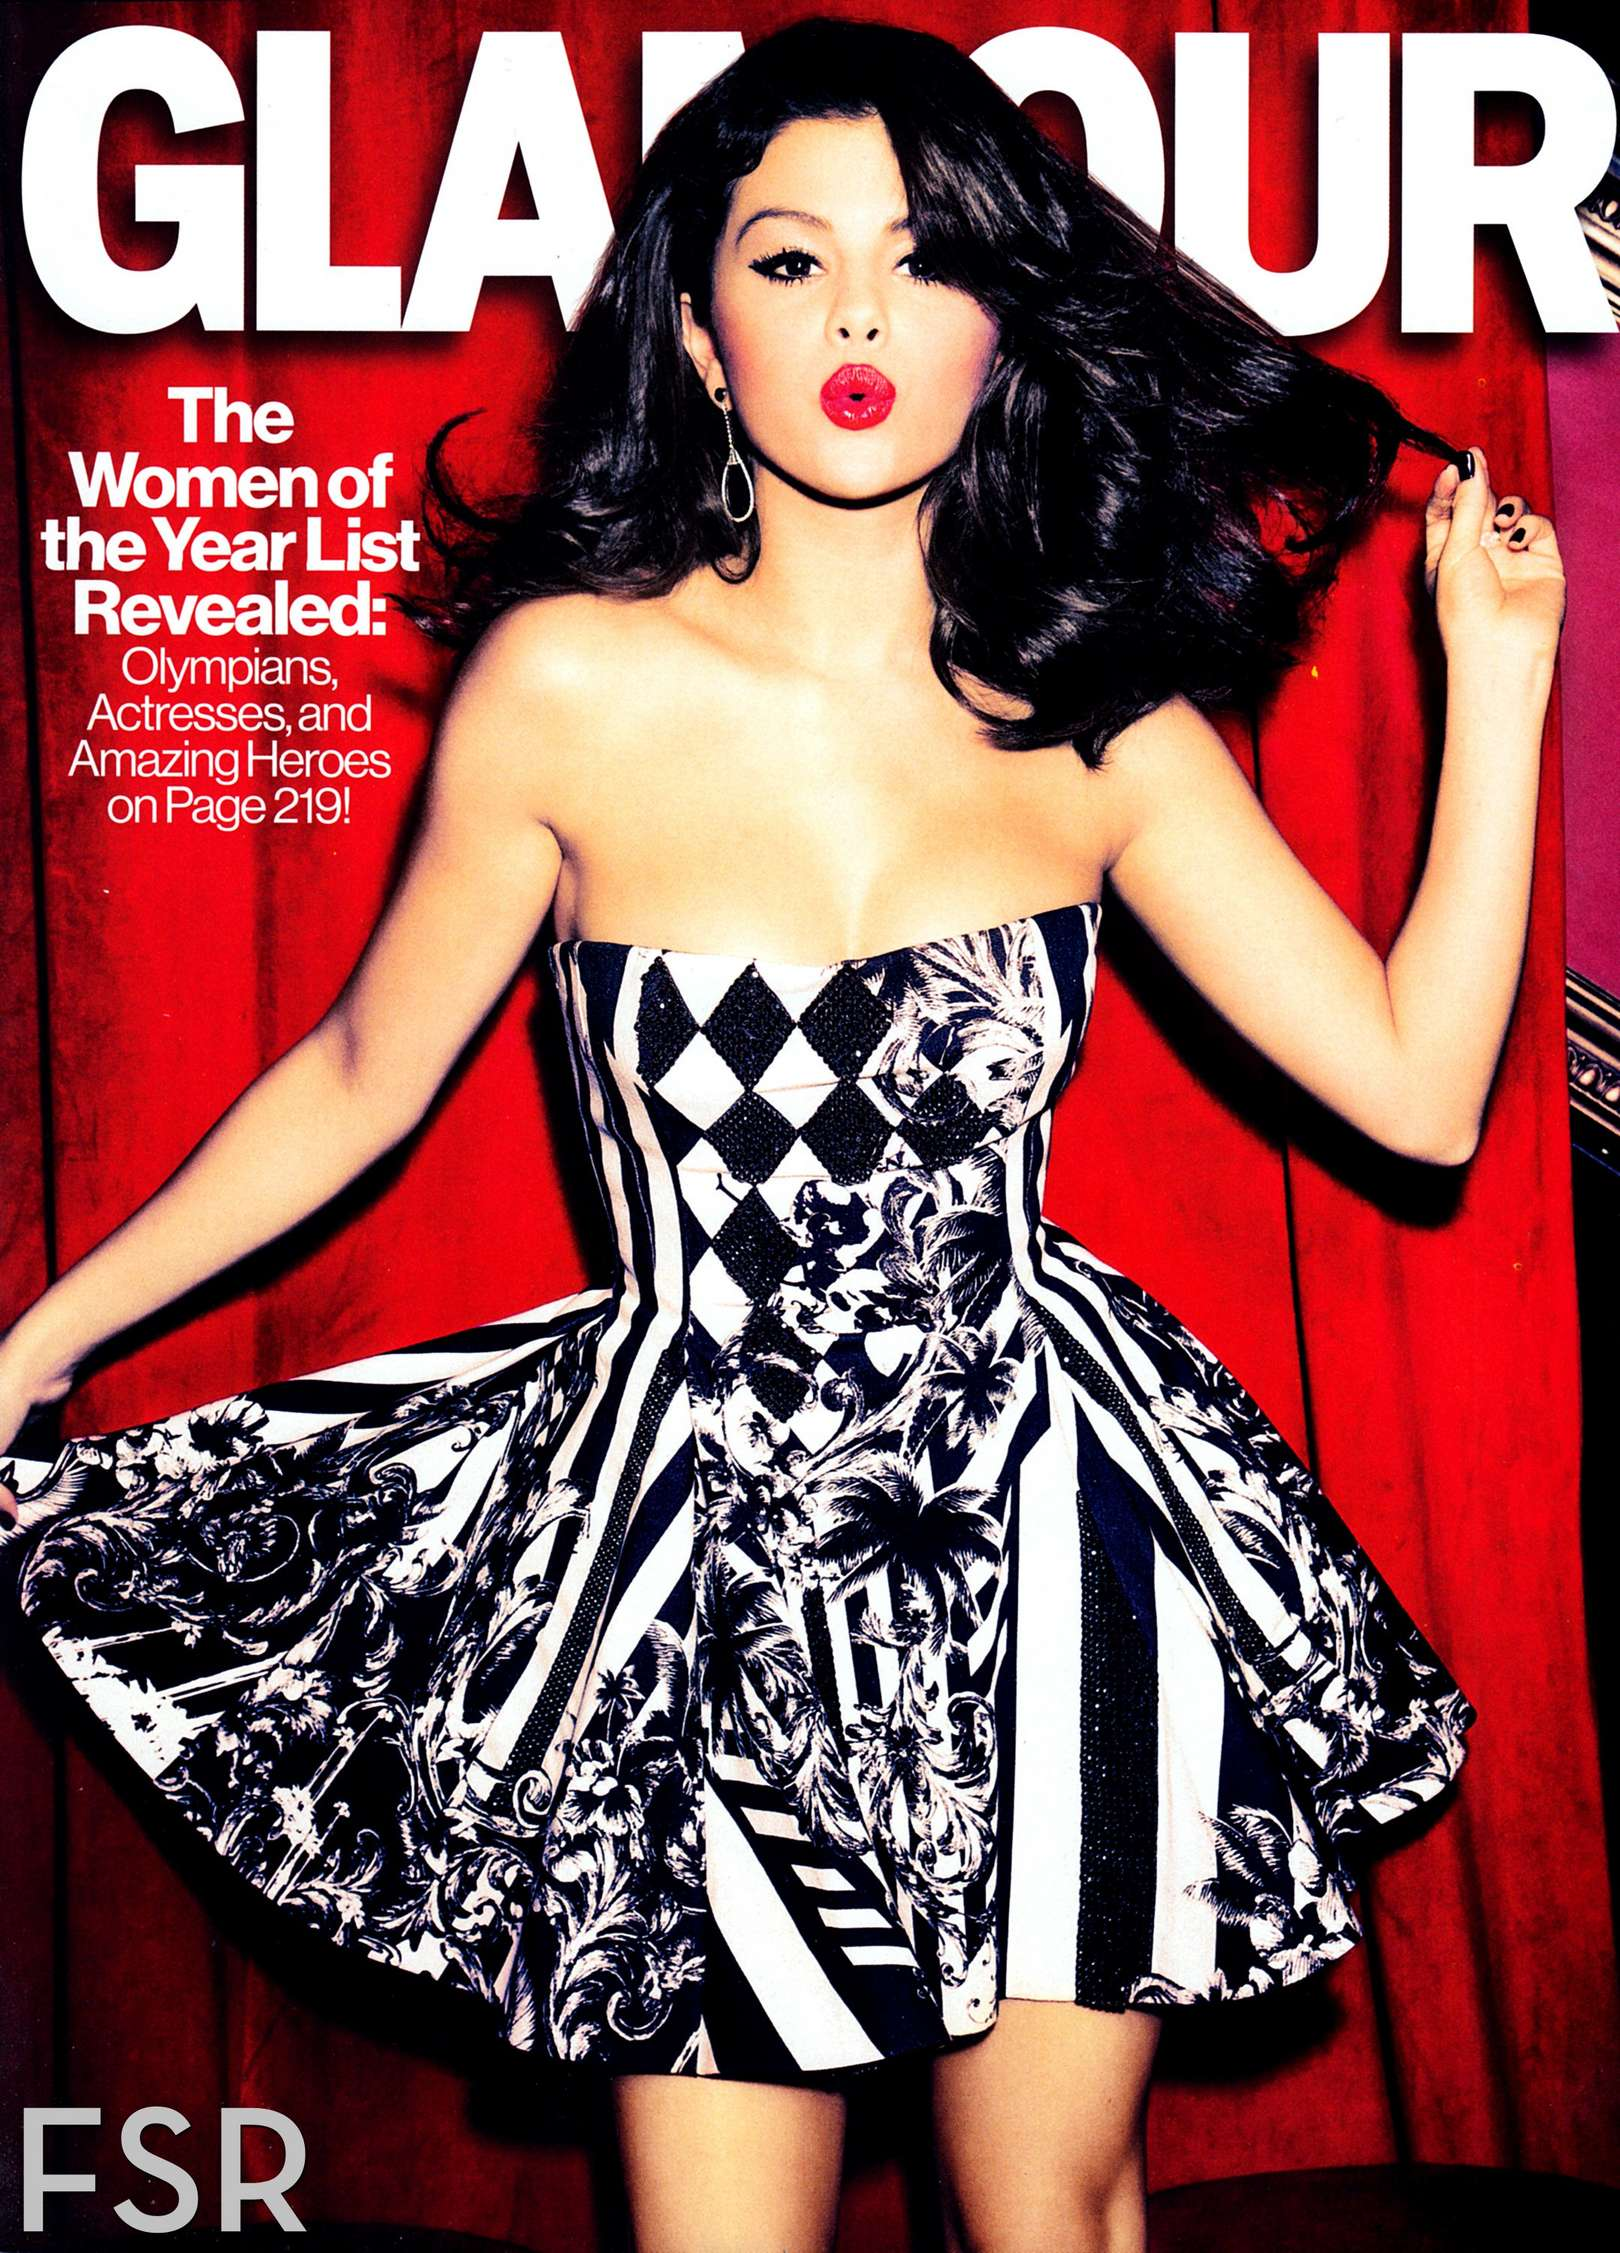 Selena%20Gomez%20-%20Glamour%20Magazine%20-01.jpg